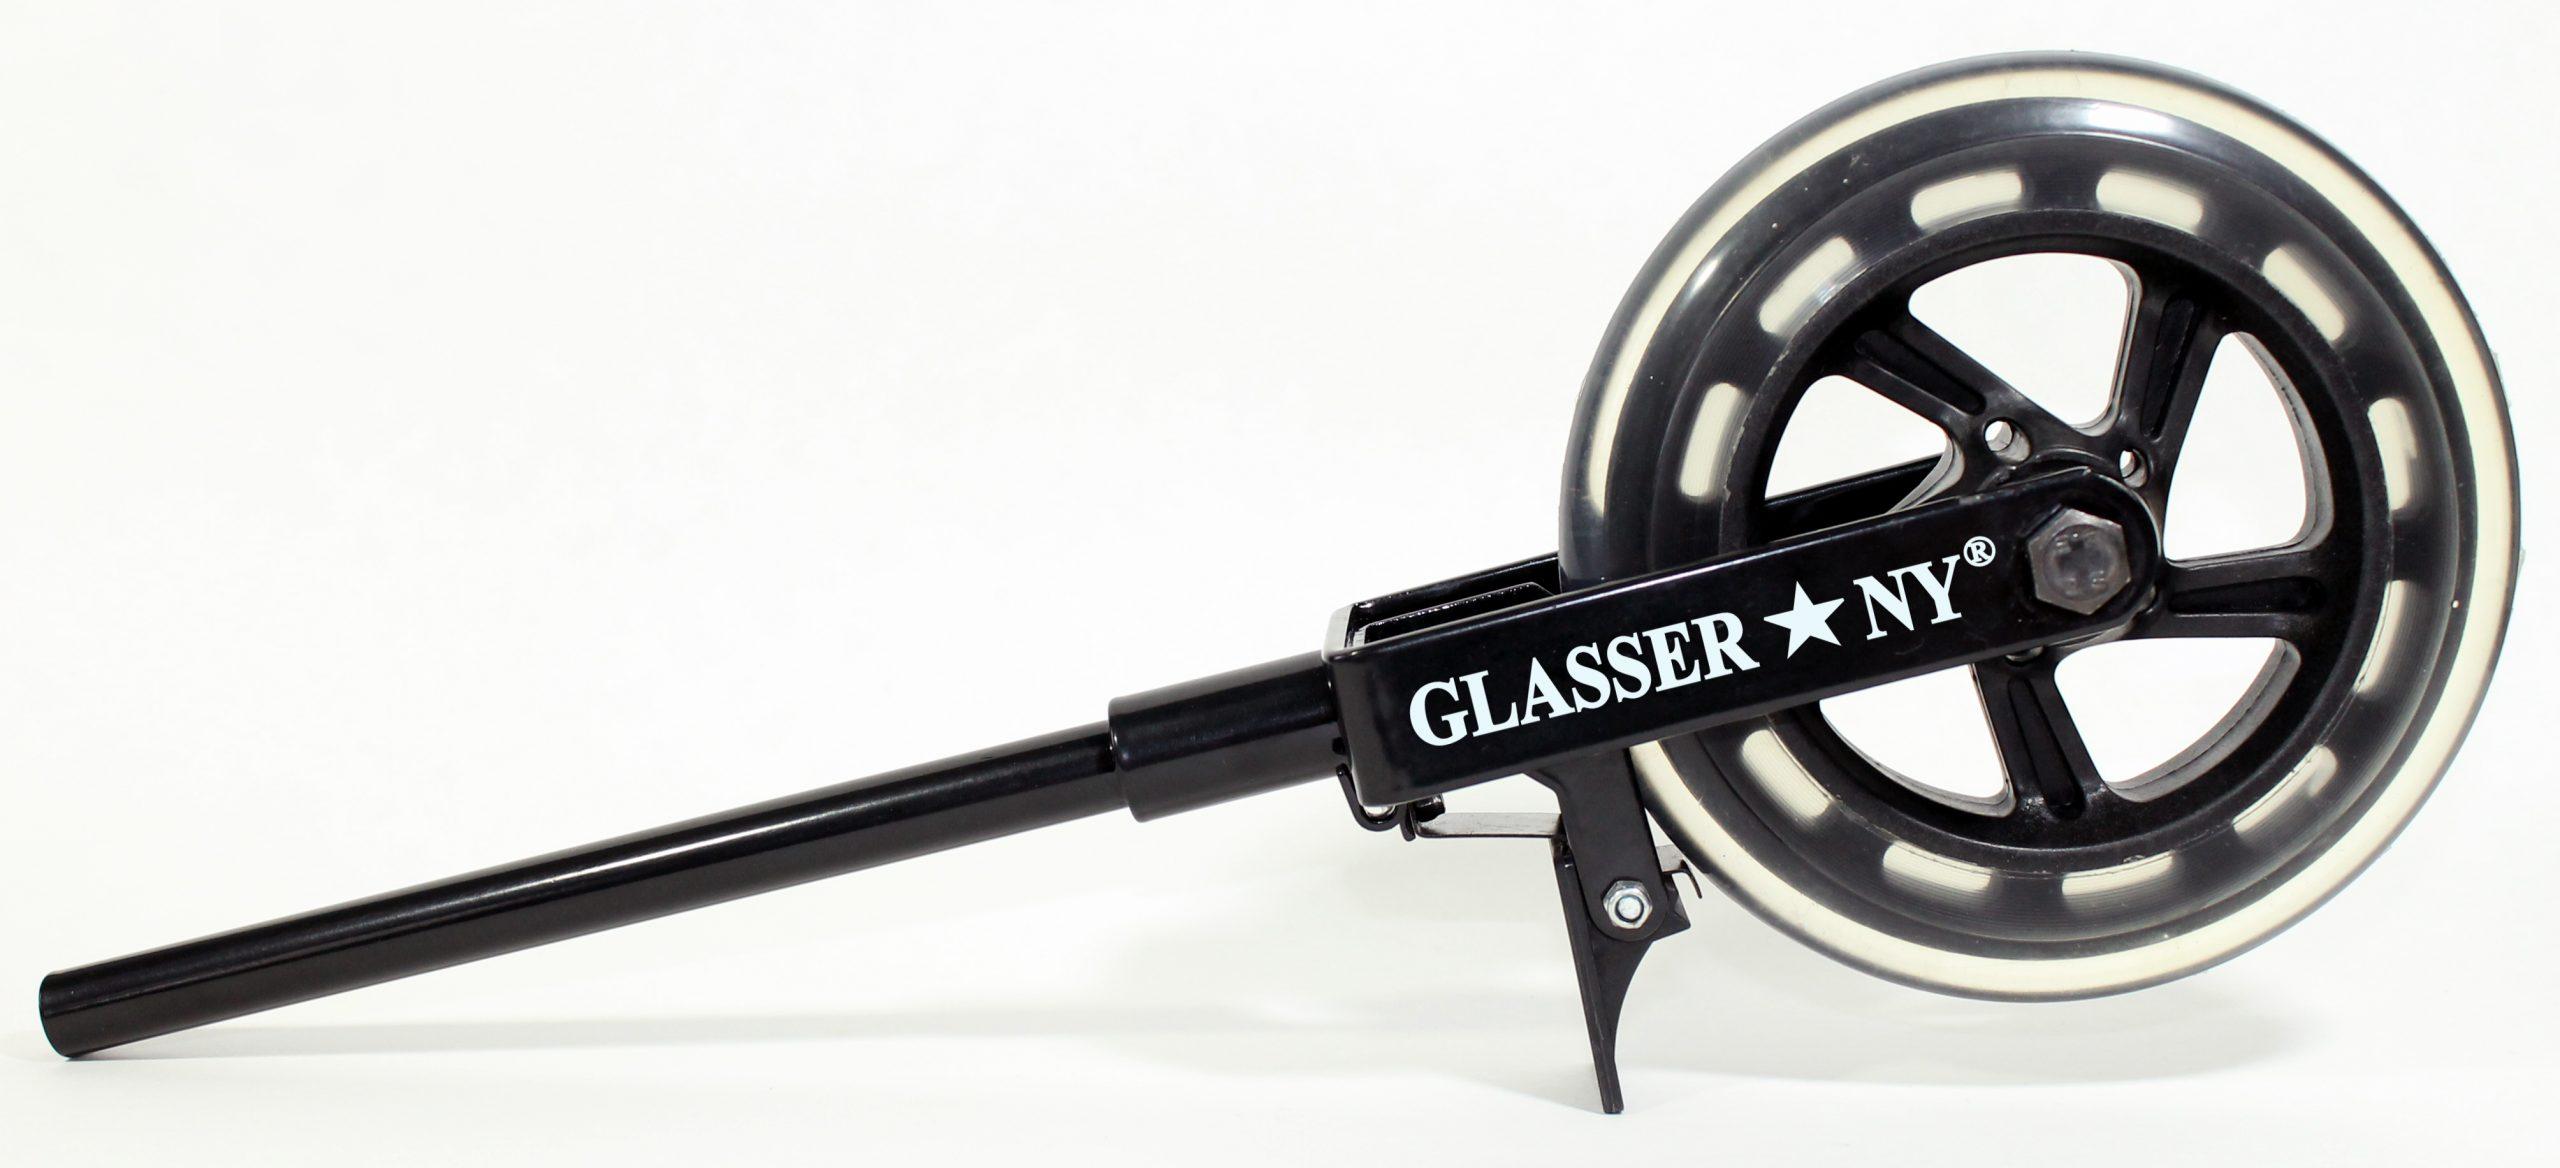 Bass Wheel 14 mm with brake